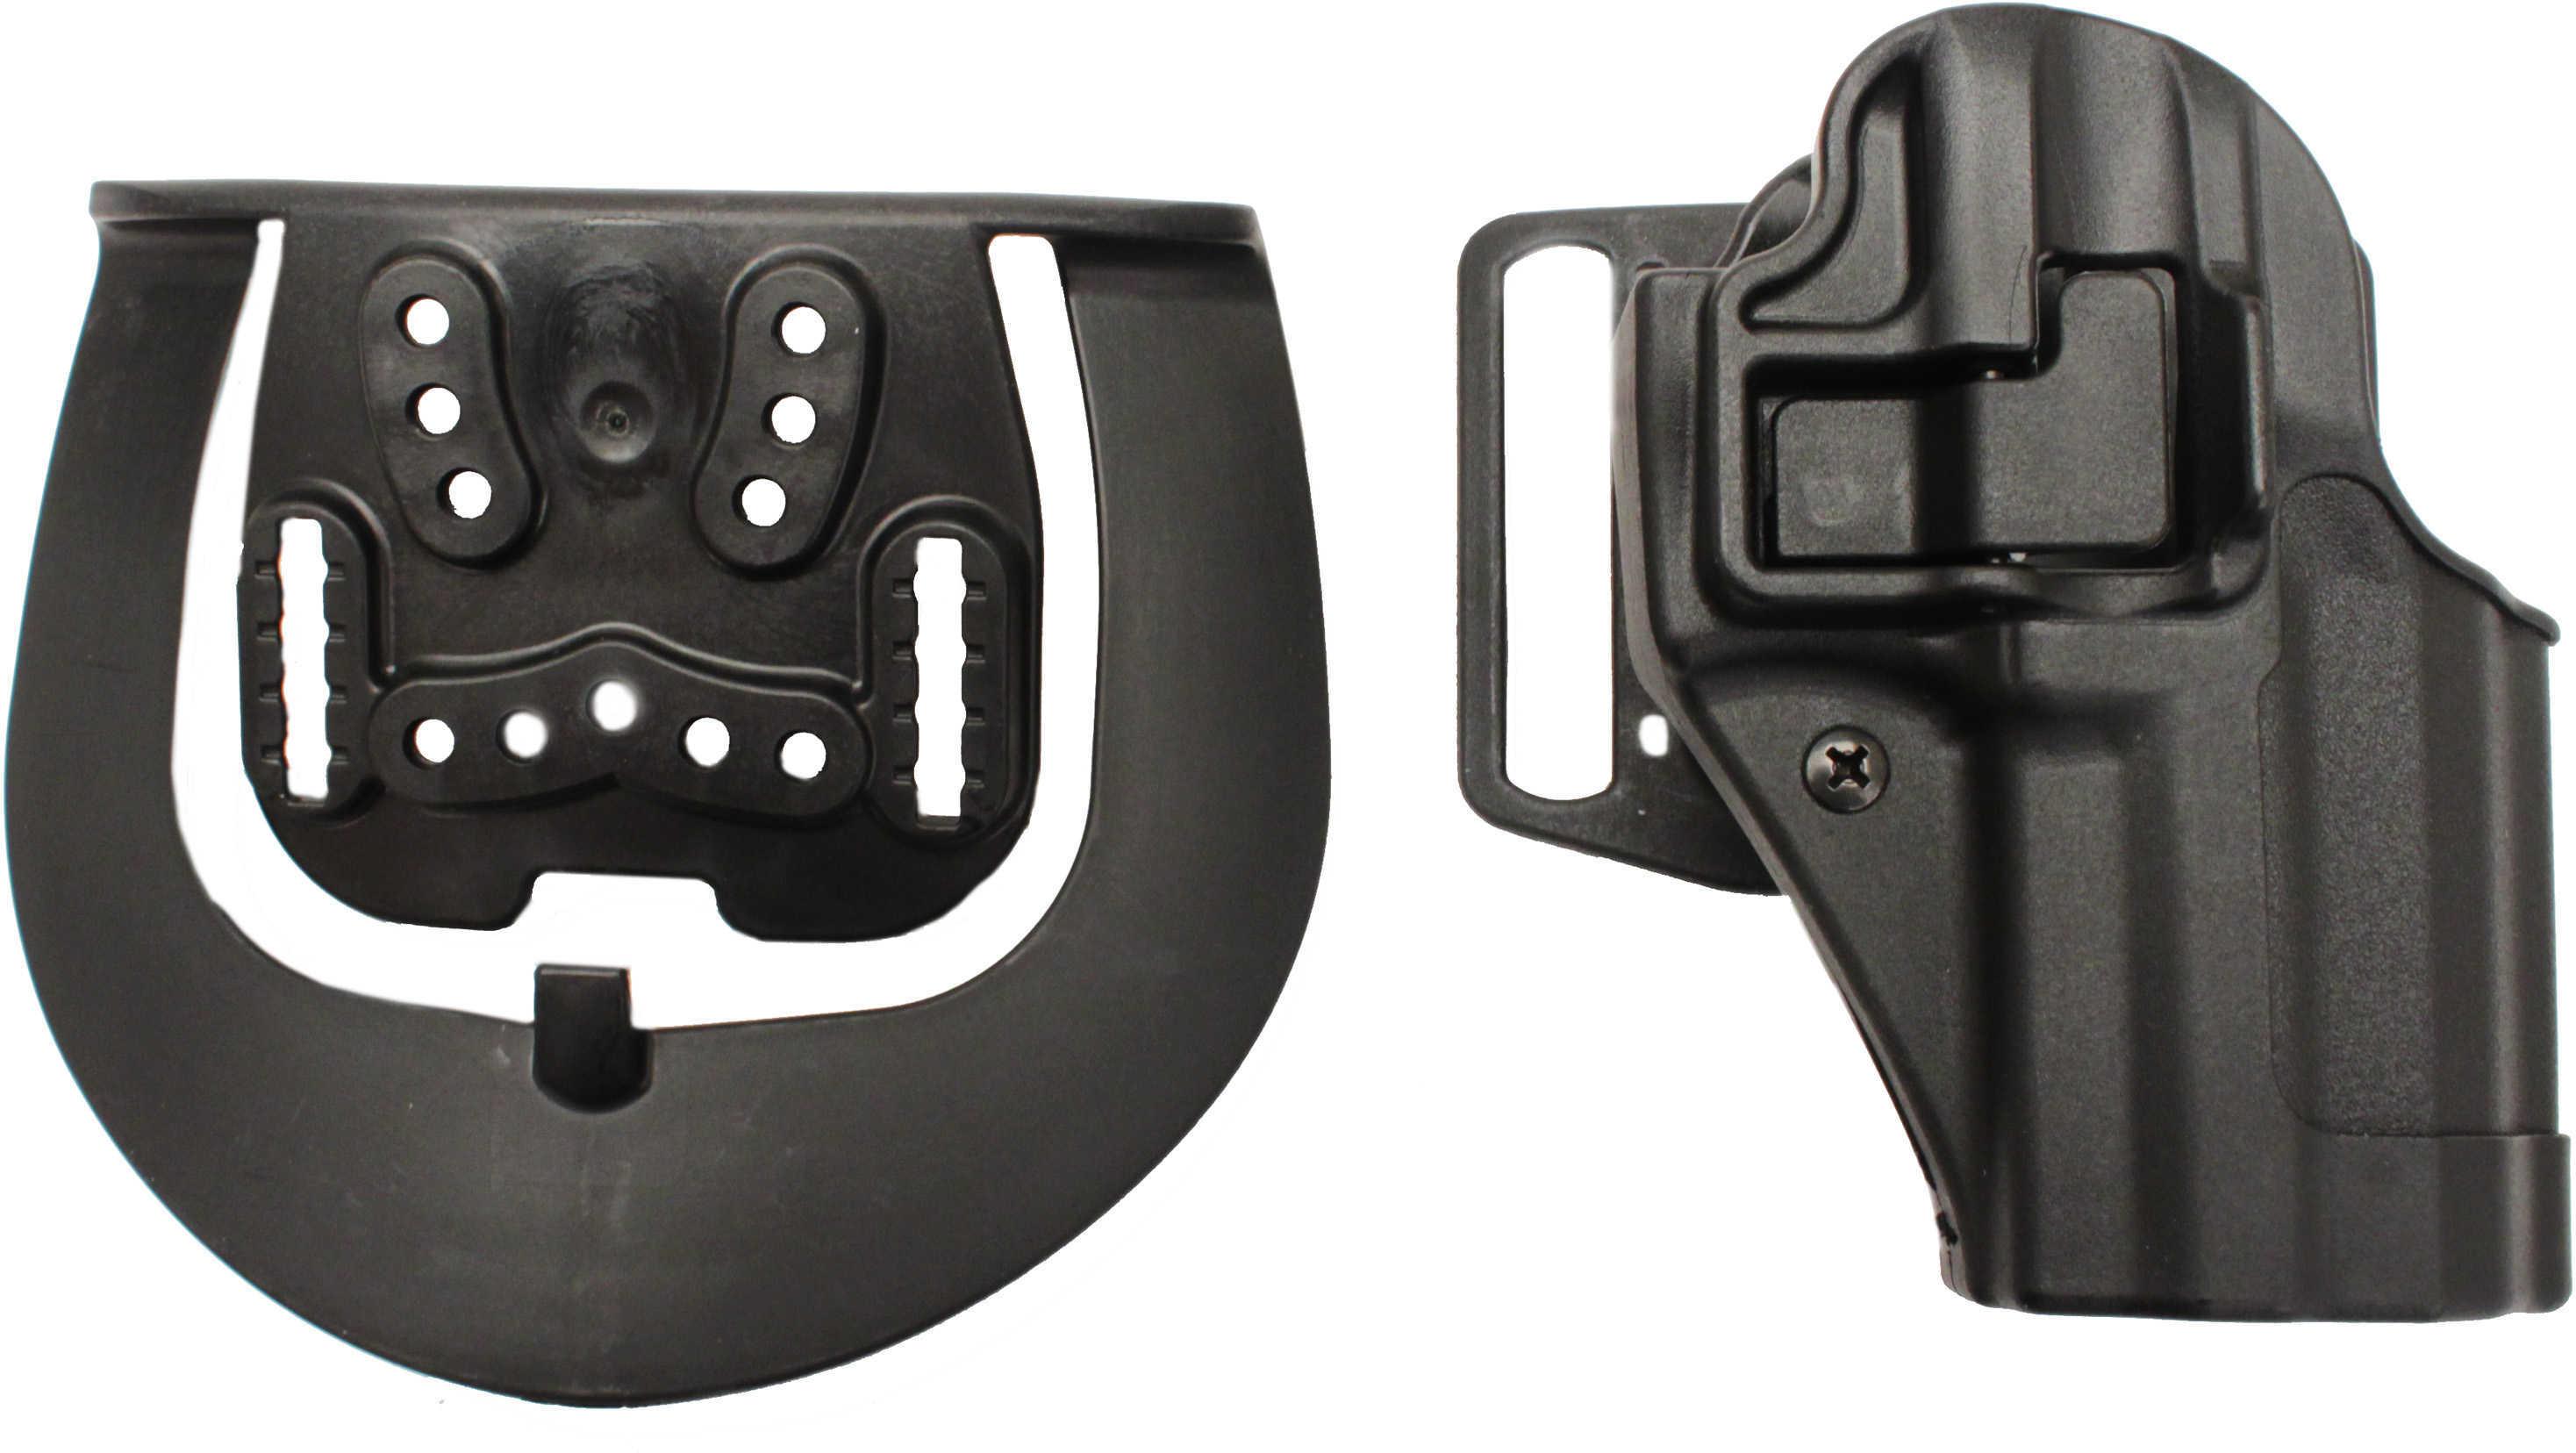 Blackhawk Carbon Fiber Serpa Belt & Paddle Holster H&K P30, Right Hand Md: 410517Bk-R